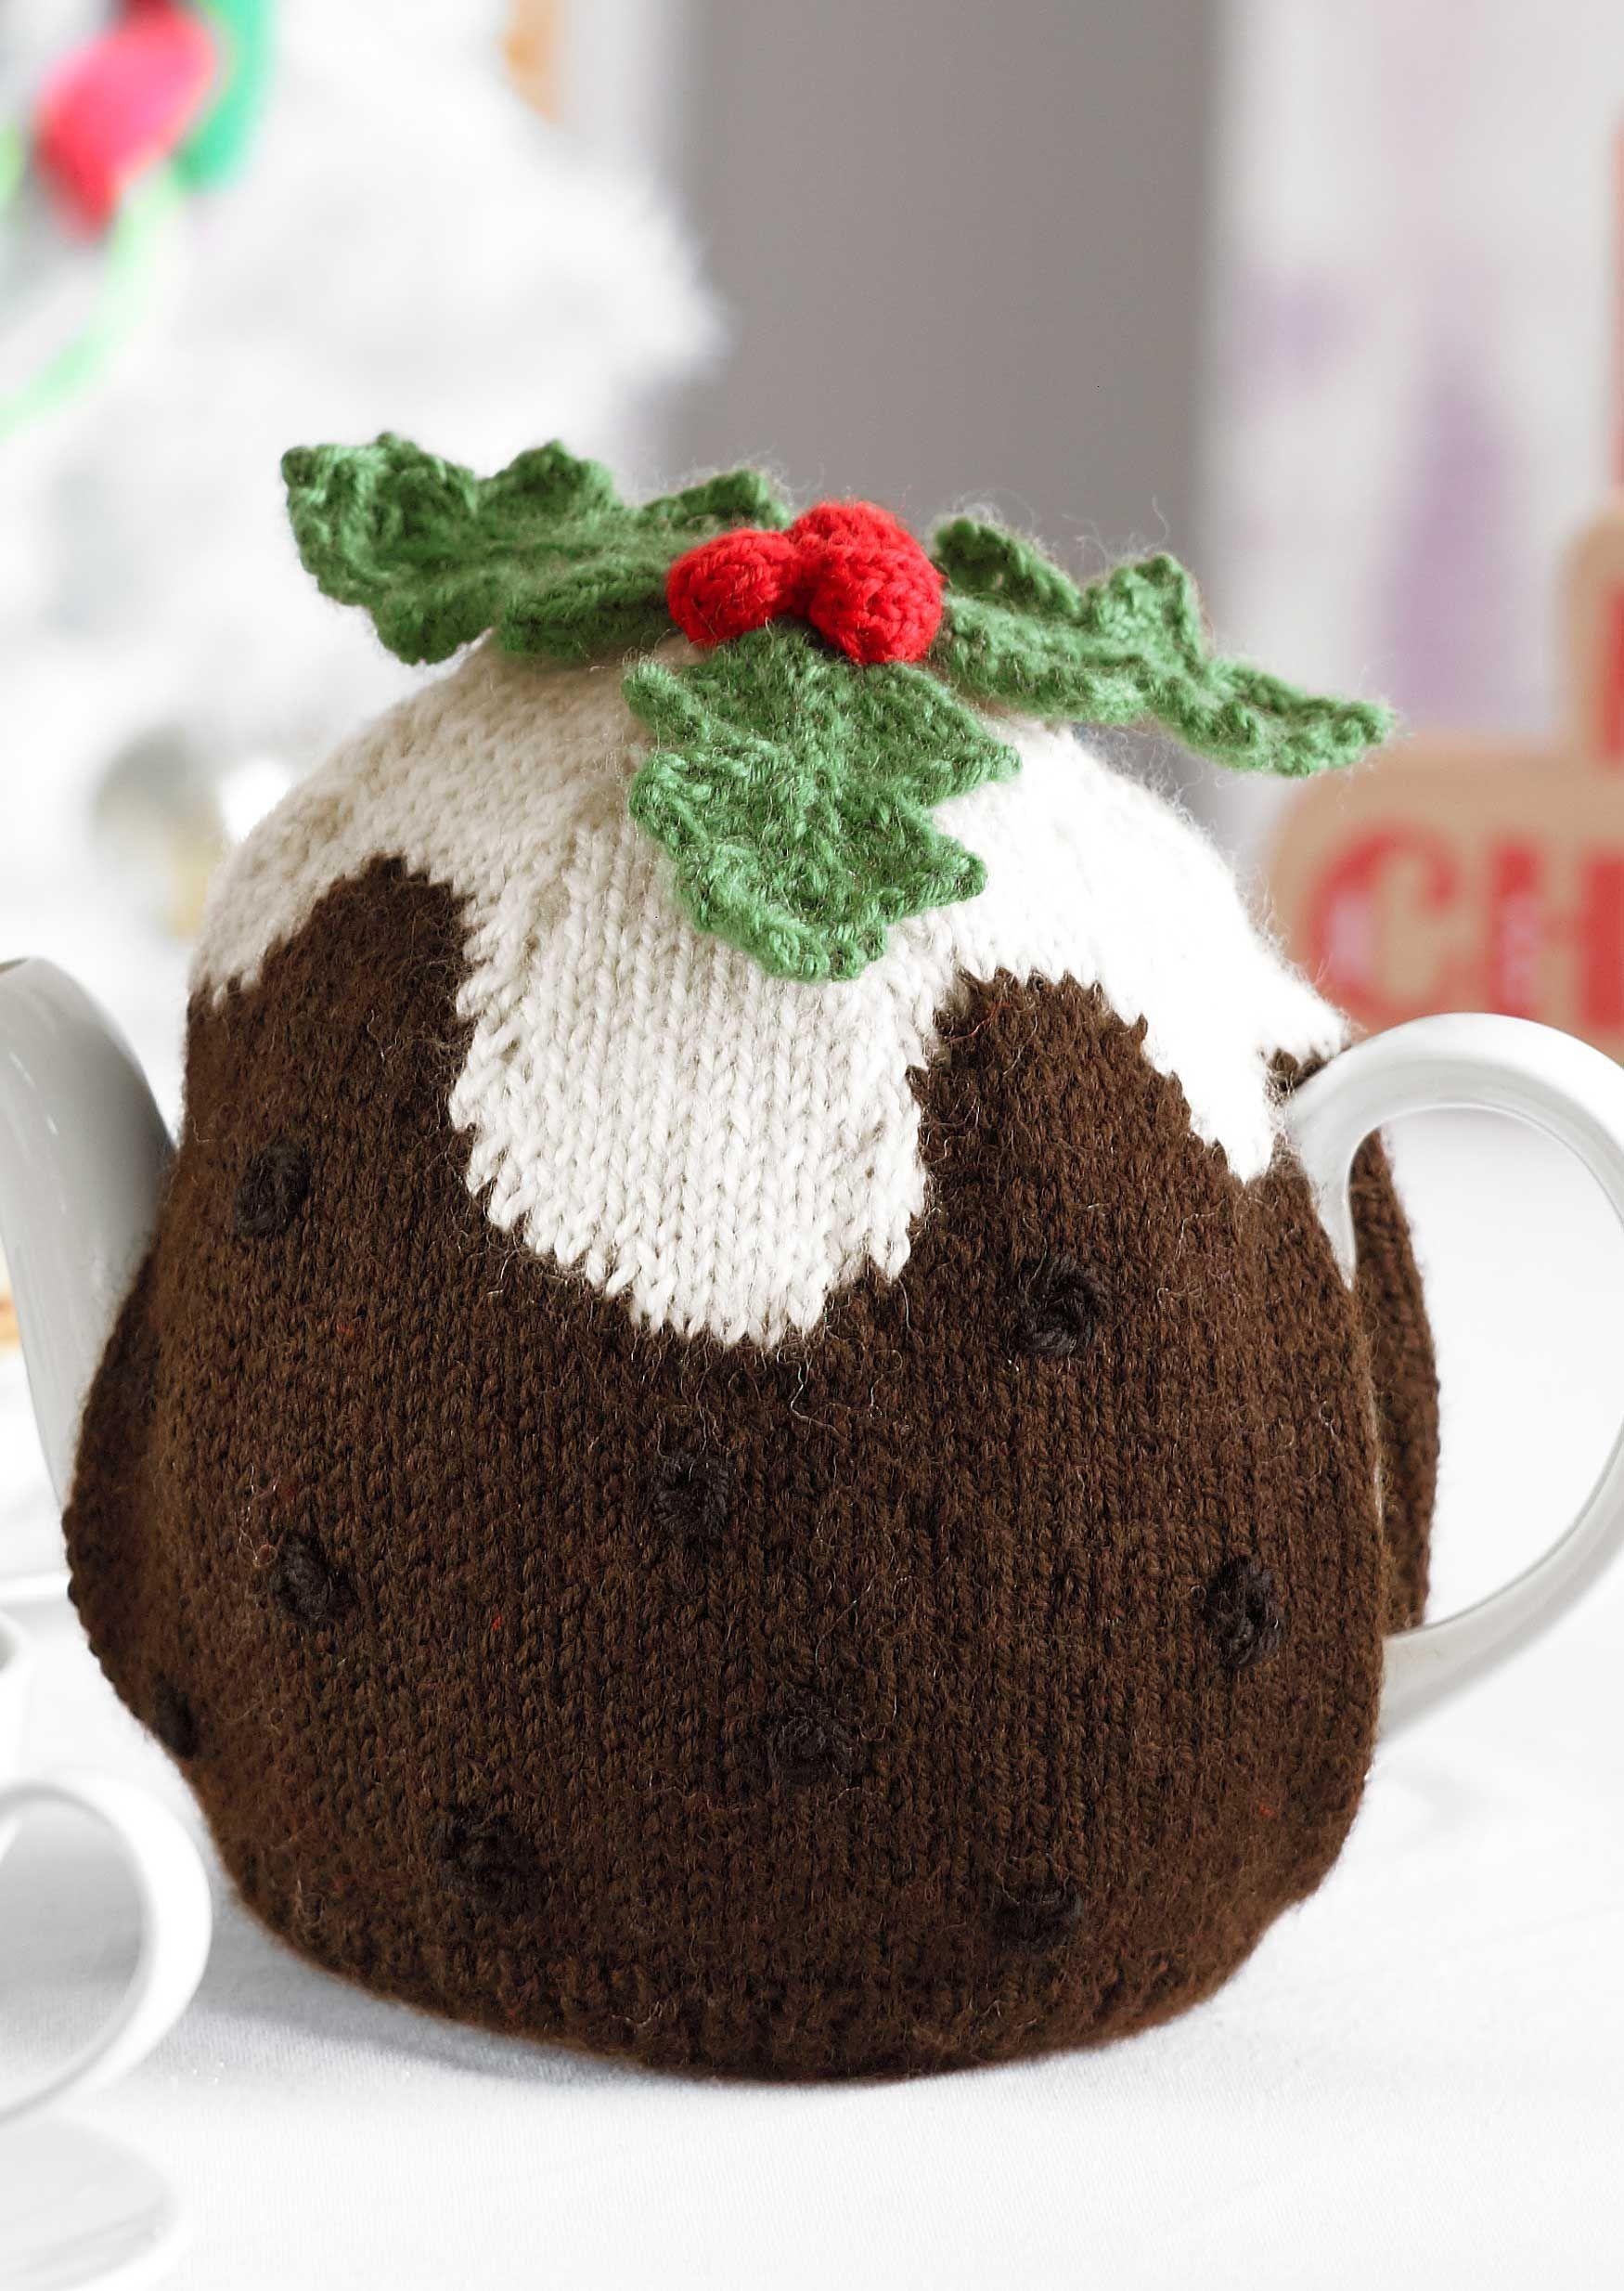 Pin de jenny en Knitting patterns | Pinterest | Bordado en hilo ...